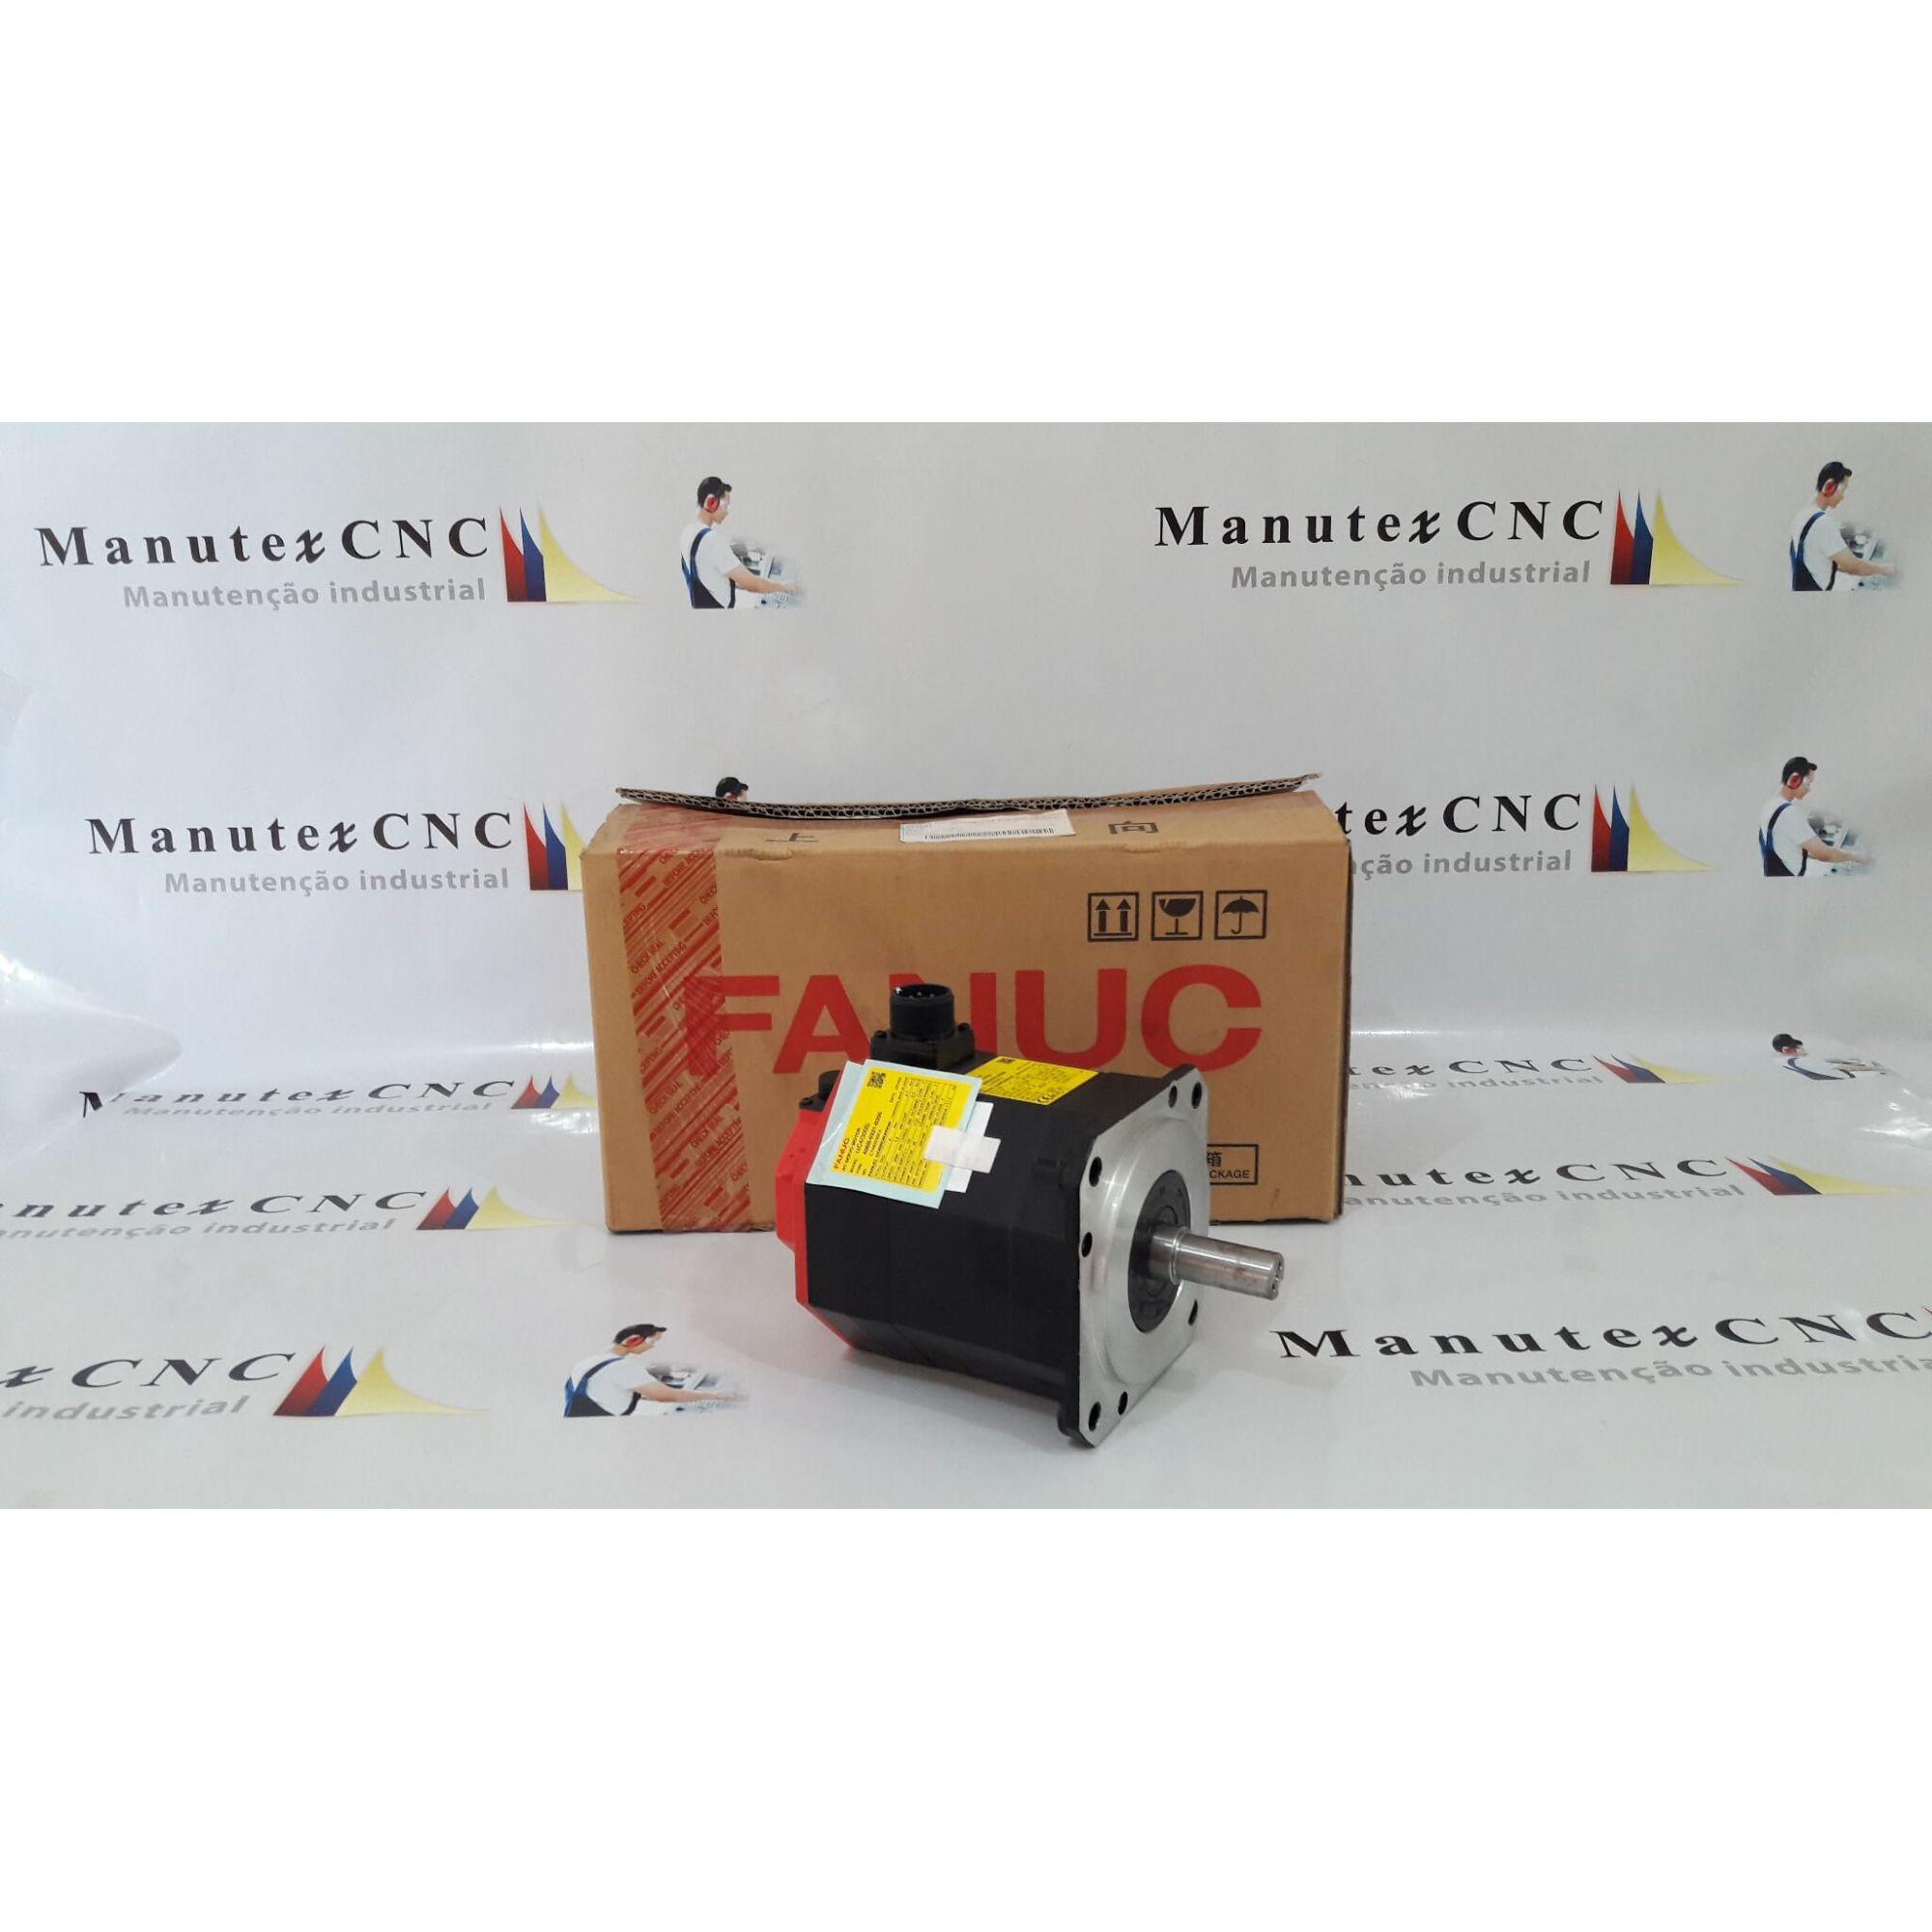 A06b-0221-B200 | SERVO MOTOR | FANUC